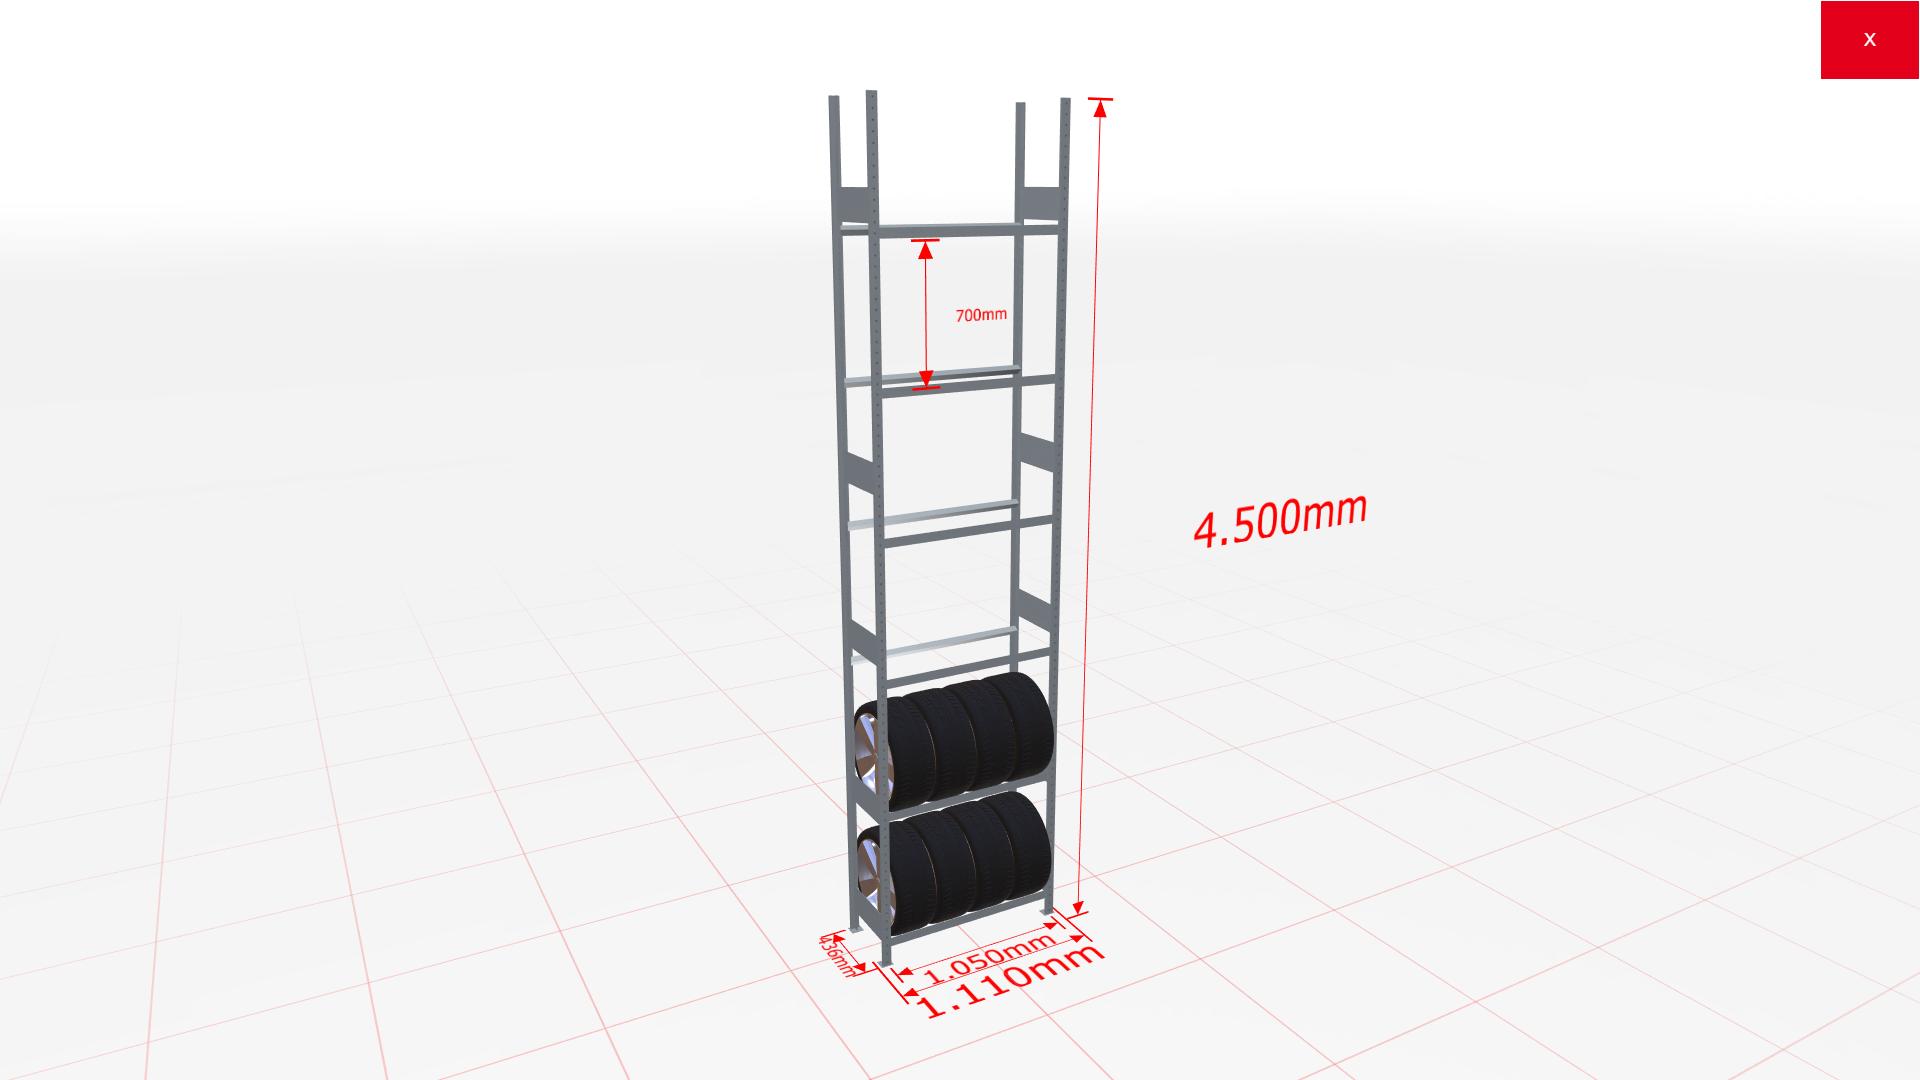 Räderregal Grundregal SCHULTE Lagertechnik 4500x1050x400 mm – 6 Ebenen á 1050 mm, verzinkt